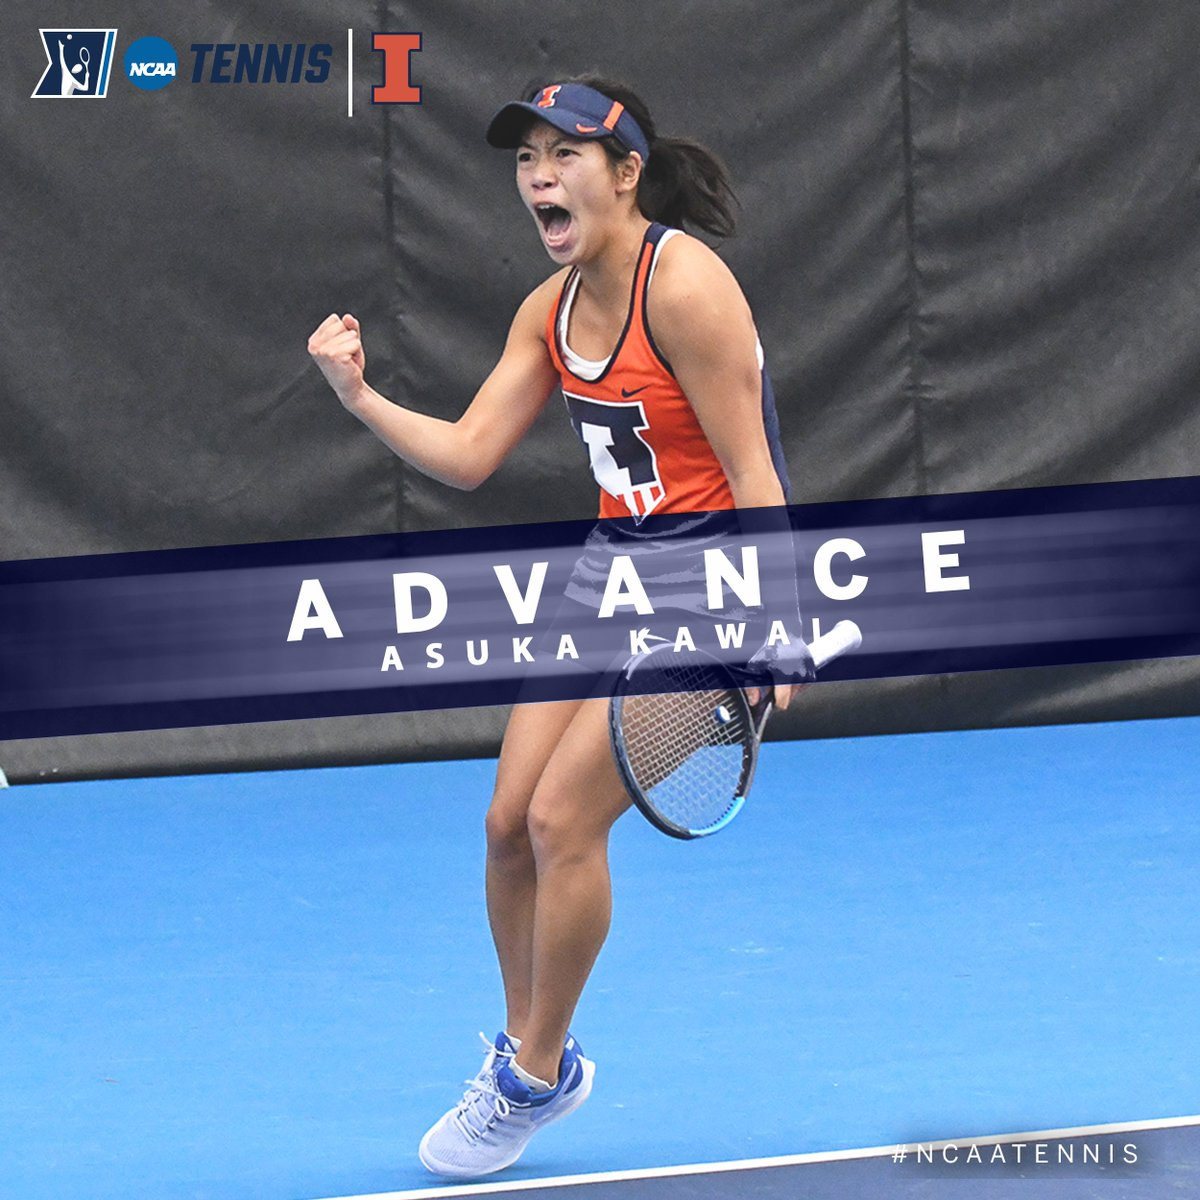 Sophomore Asuka Kawai of @IlliniWTennis advances to the @NCAATennis Singles Quarterfinals after upsetting No. 7 seed Alexa Graham of North Carolina, 7-5, 6-3. #B1GWTennis